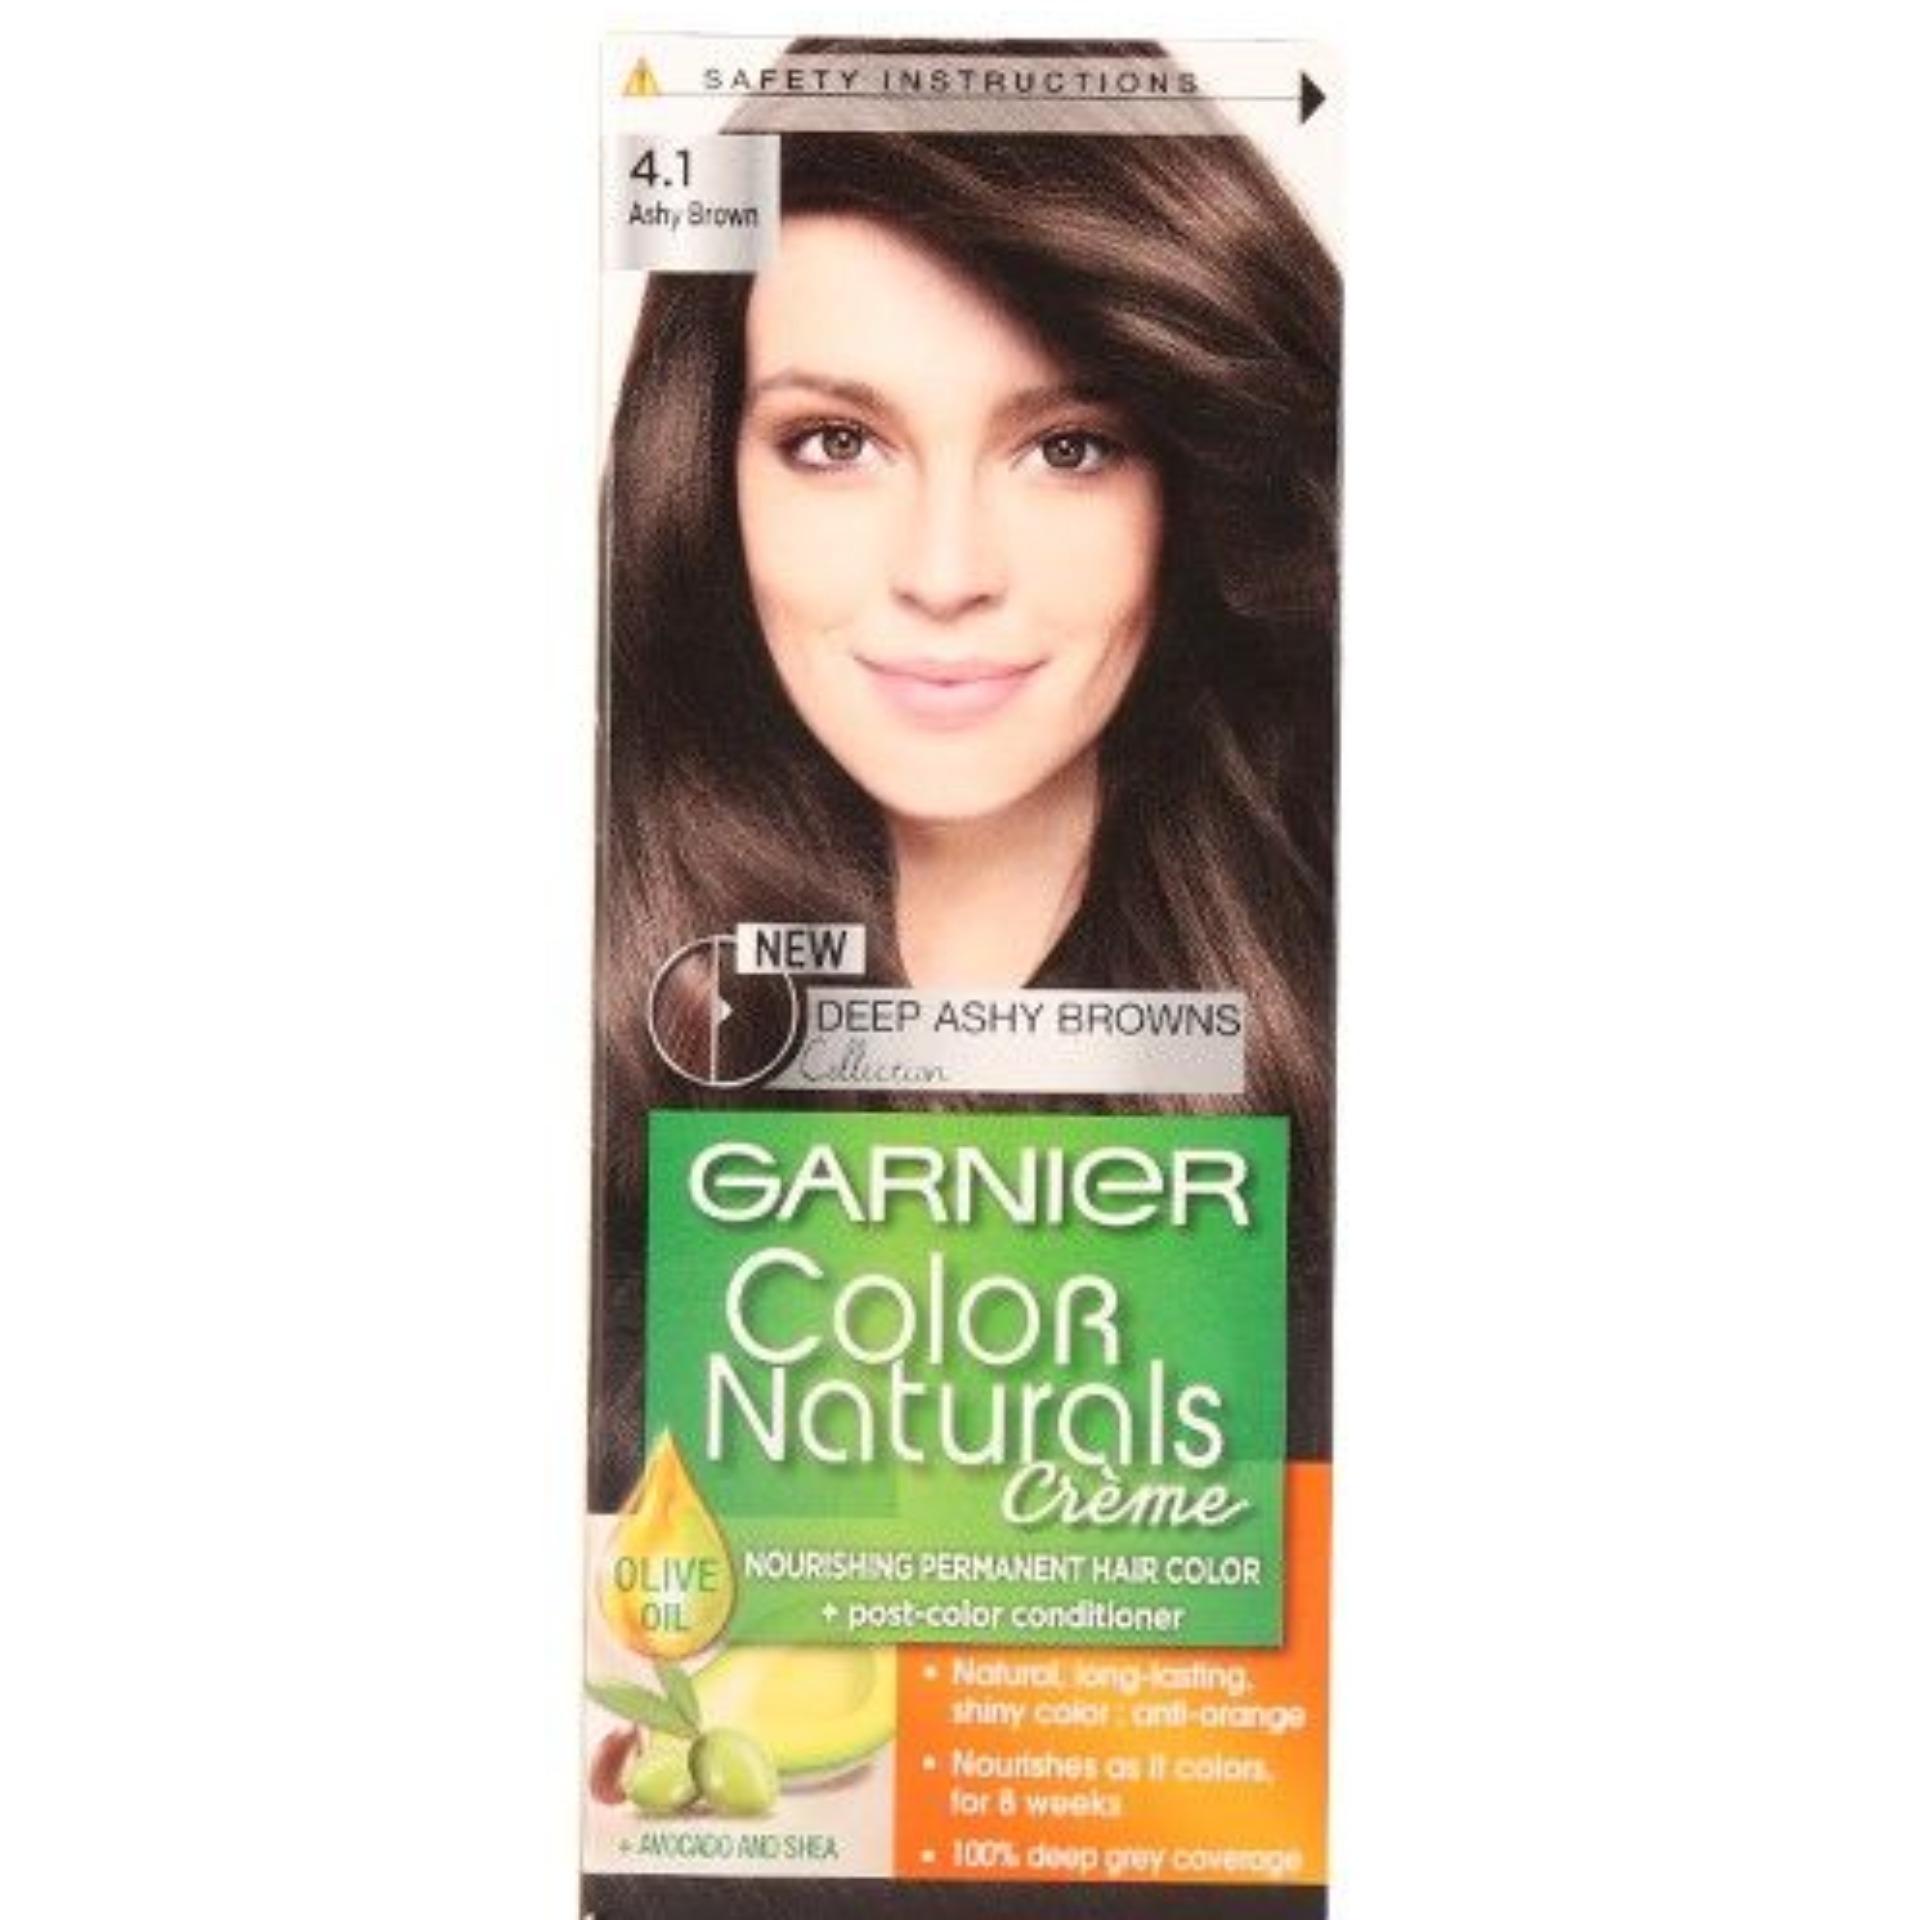 Garnier Color Naturals 4.1 Ashy Brown Hair Color